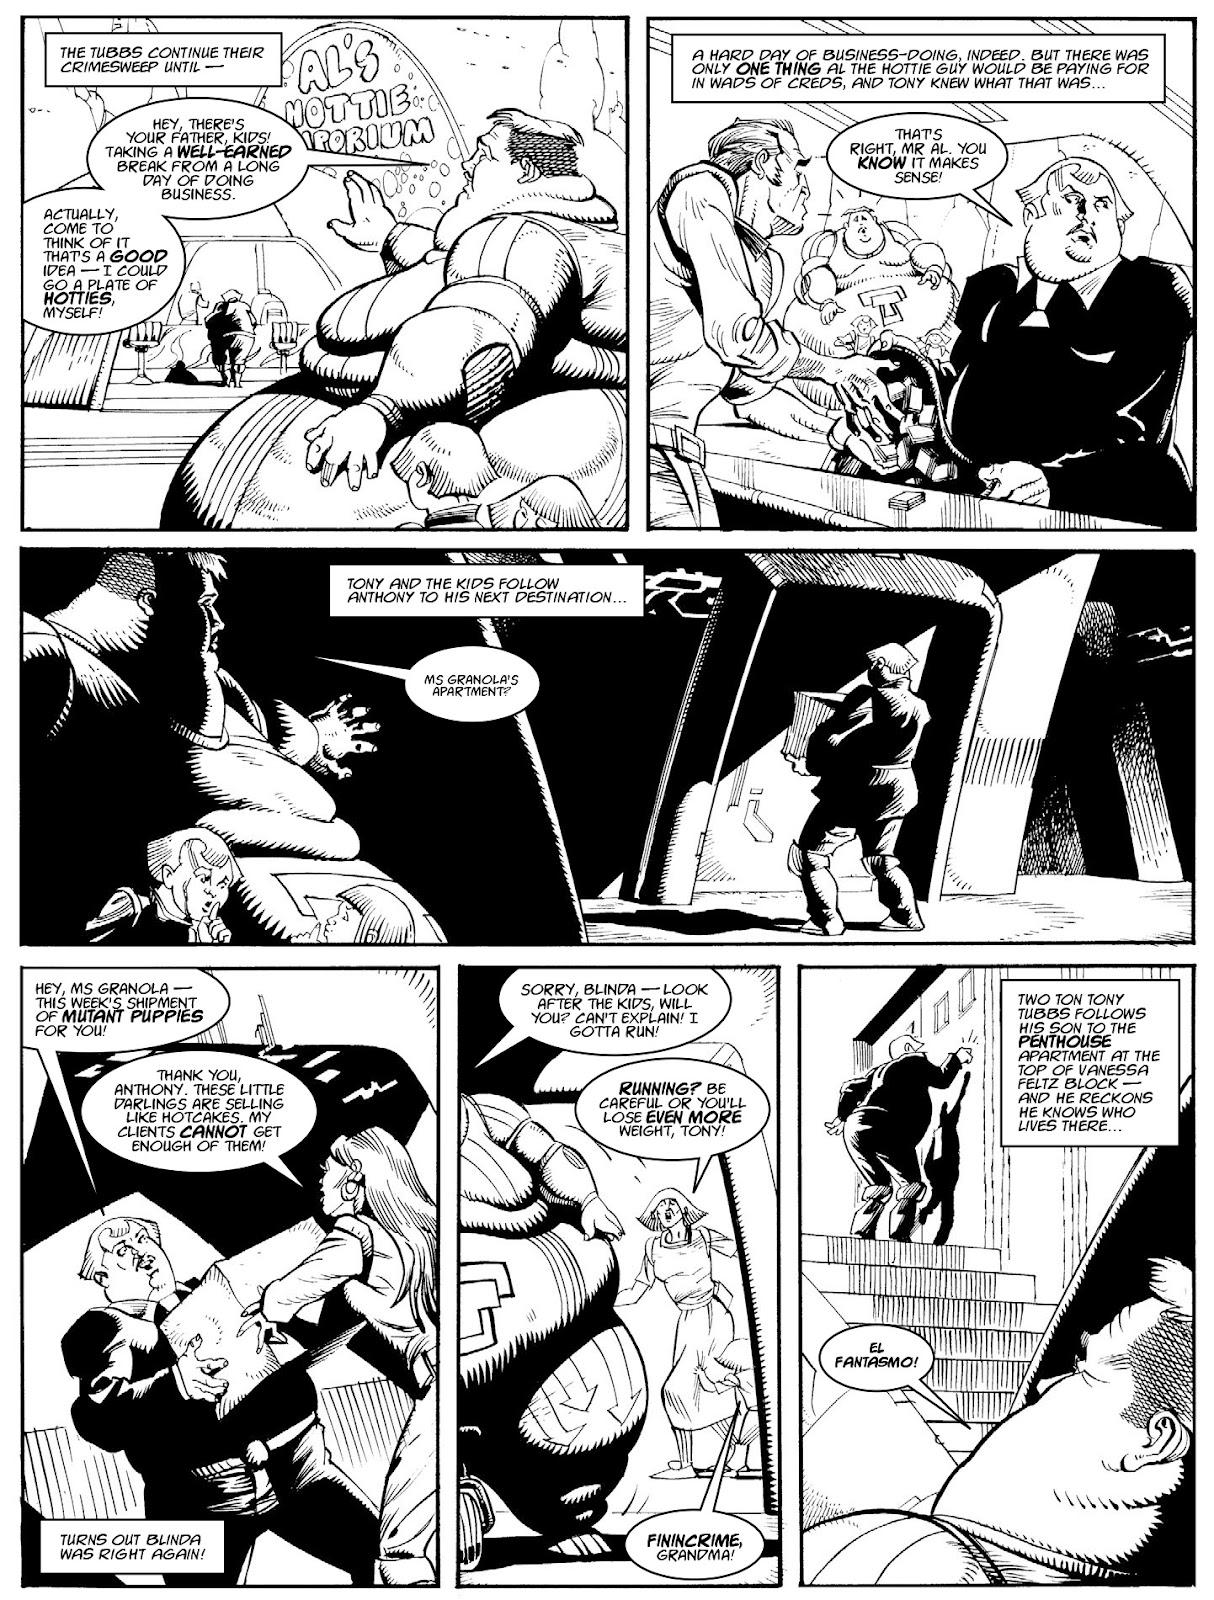 Judge Dredd Megazine (Vol. 5) issue 427 - Page 124